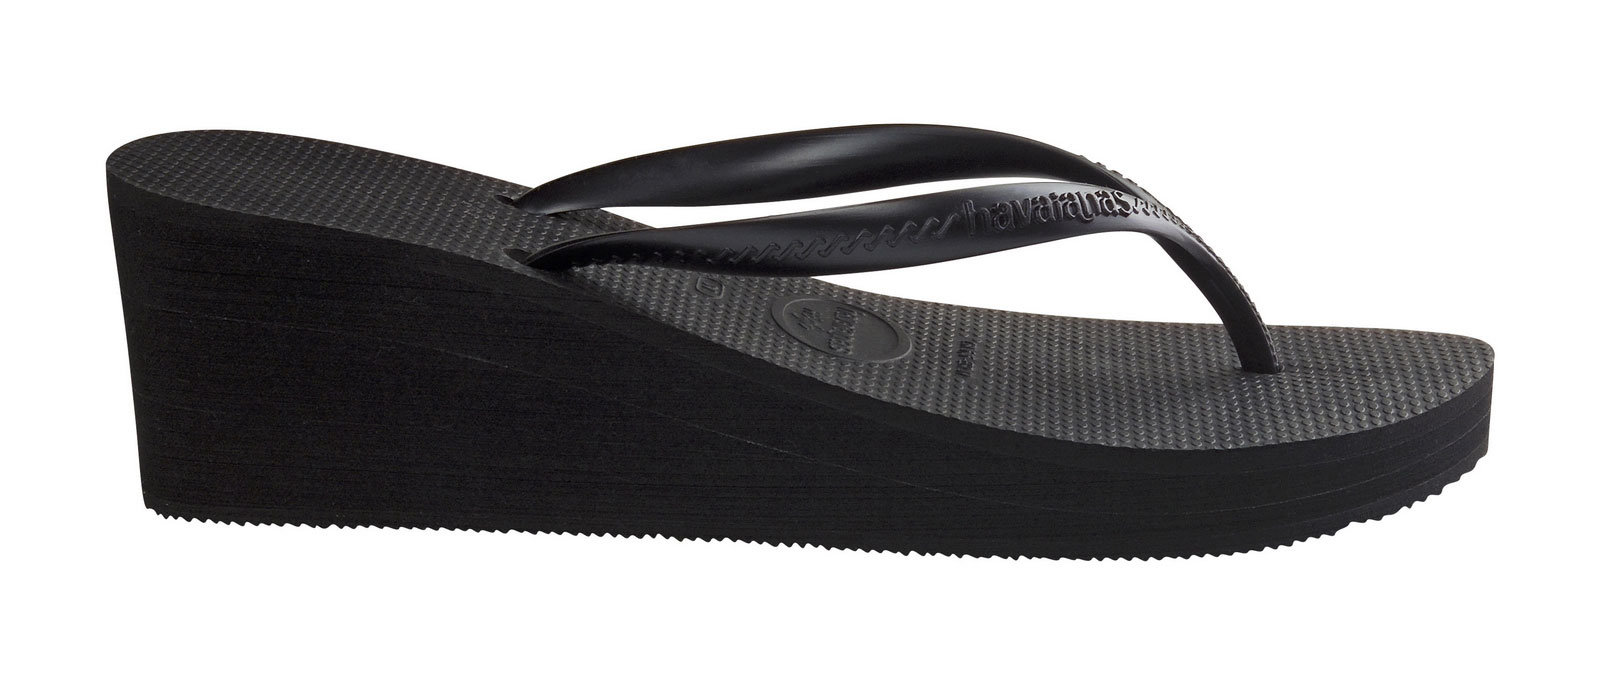 d37253e03f610a Flip-Flops Flip-flops - High Fashion Black - Brand Havaianas